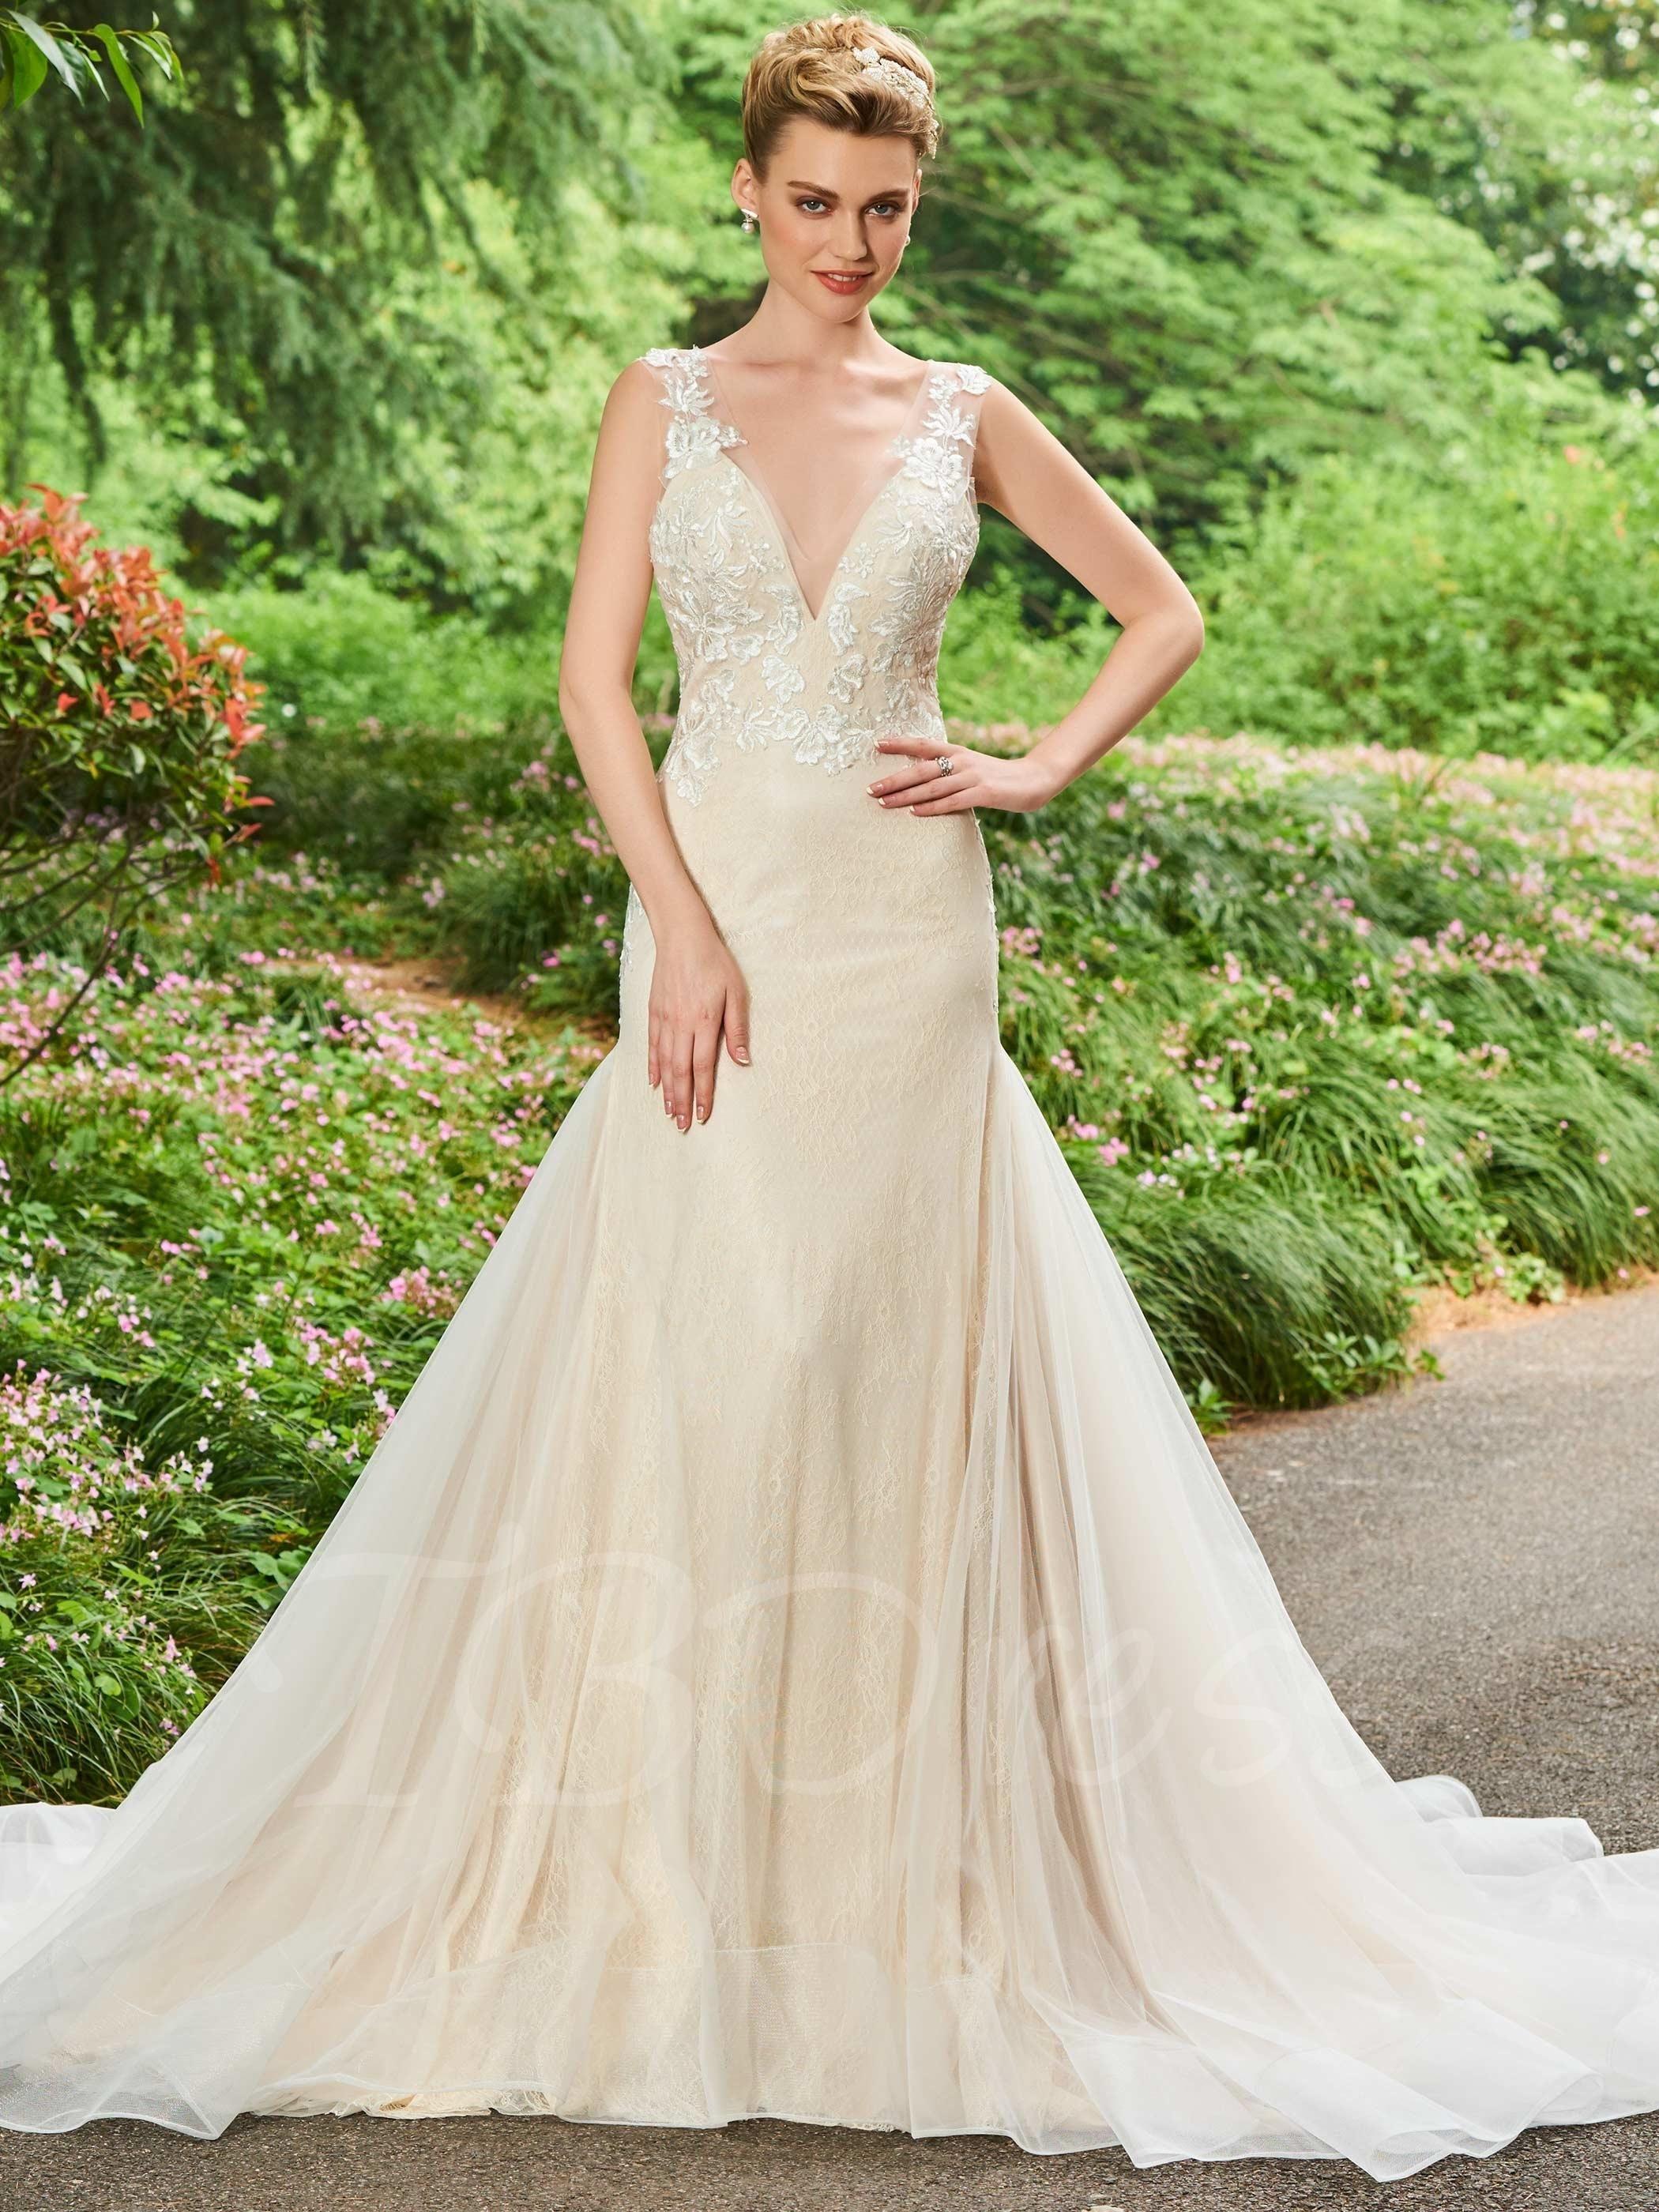 Mermaid lace wedding dress  TBDress  TBDress VNeck Appliques Mermaid Lace Wedding Dress